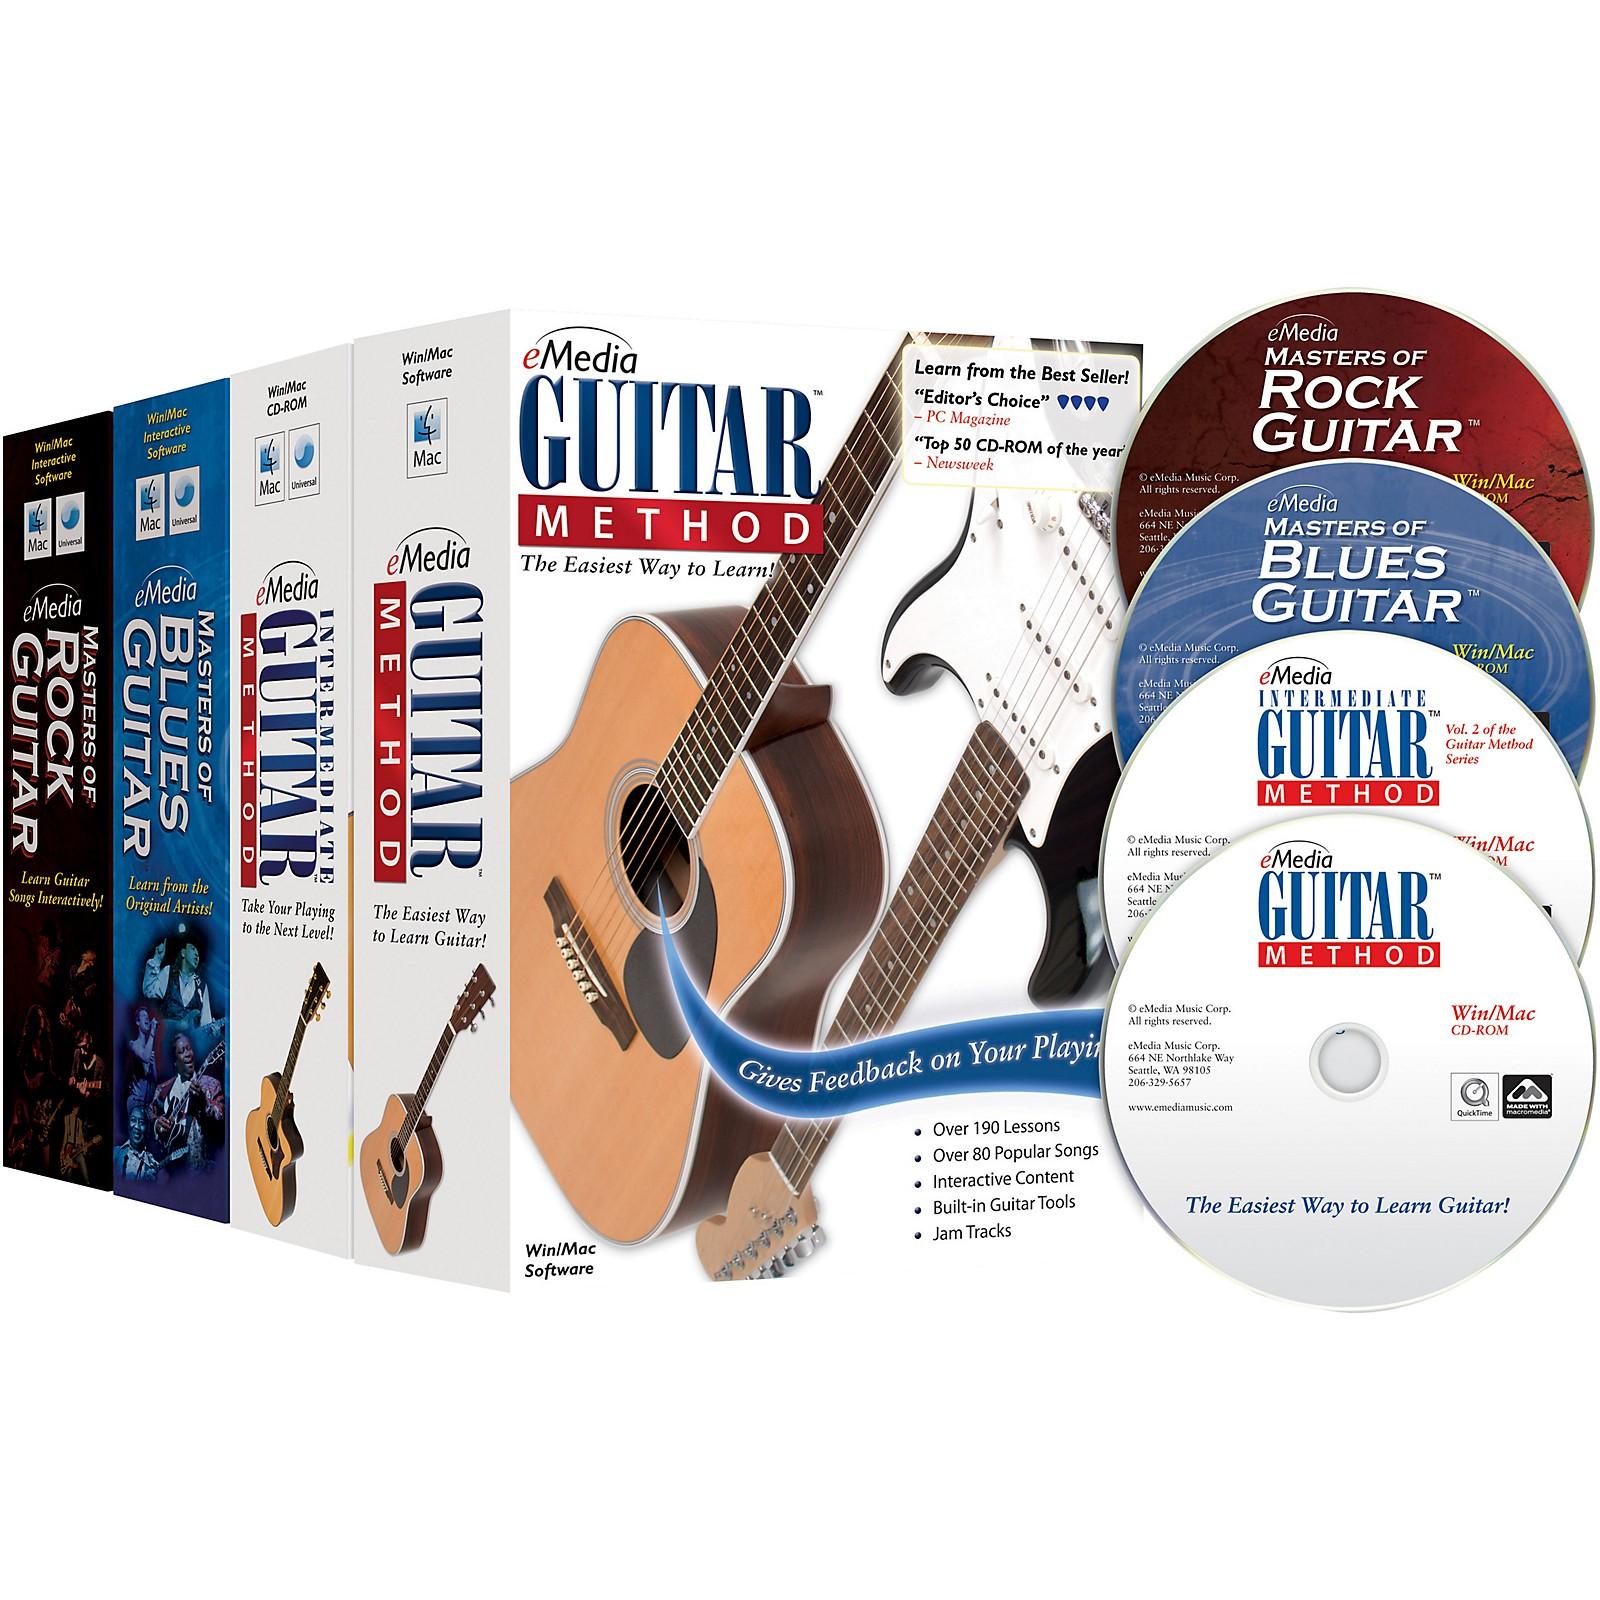 eMedia Guitar Collection (2018 Edition) - 4 Volume Set